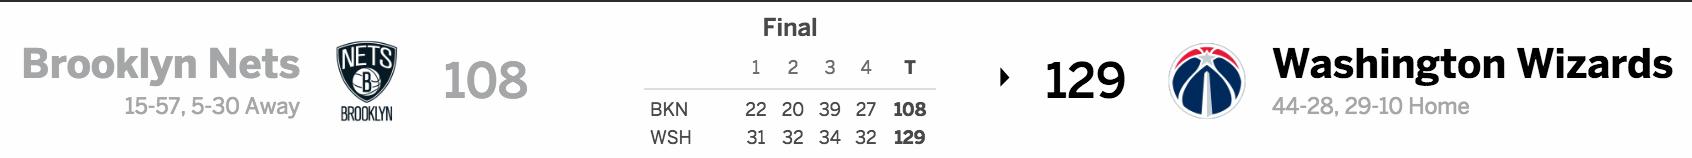 Brooklyn Nets vs Washington Wizards 3/24/17 Score